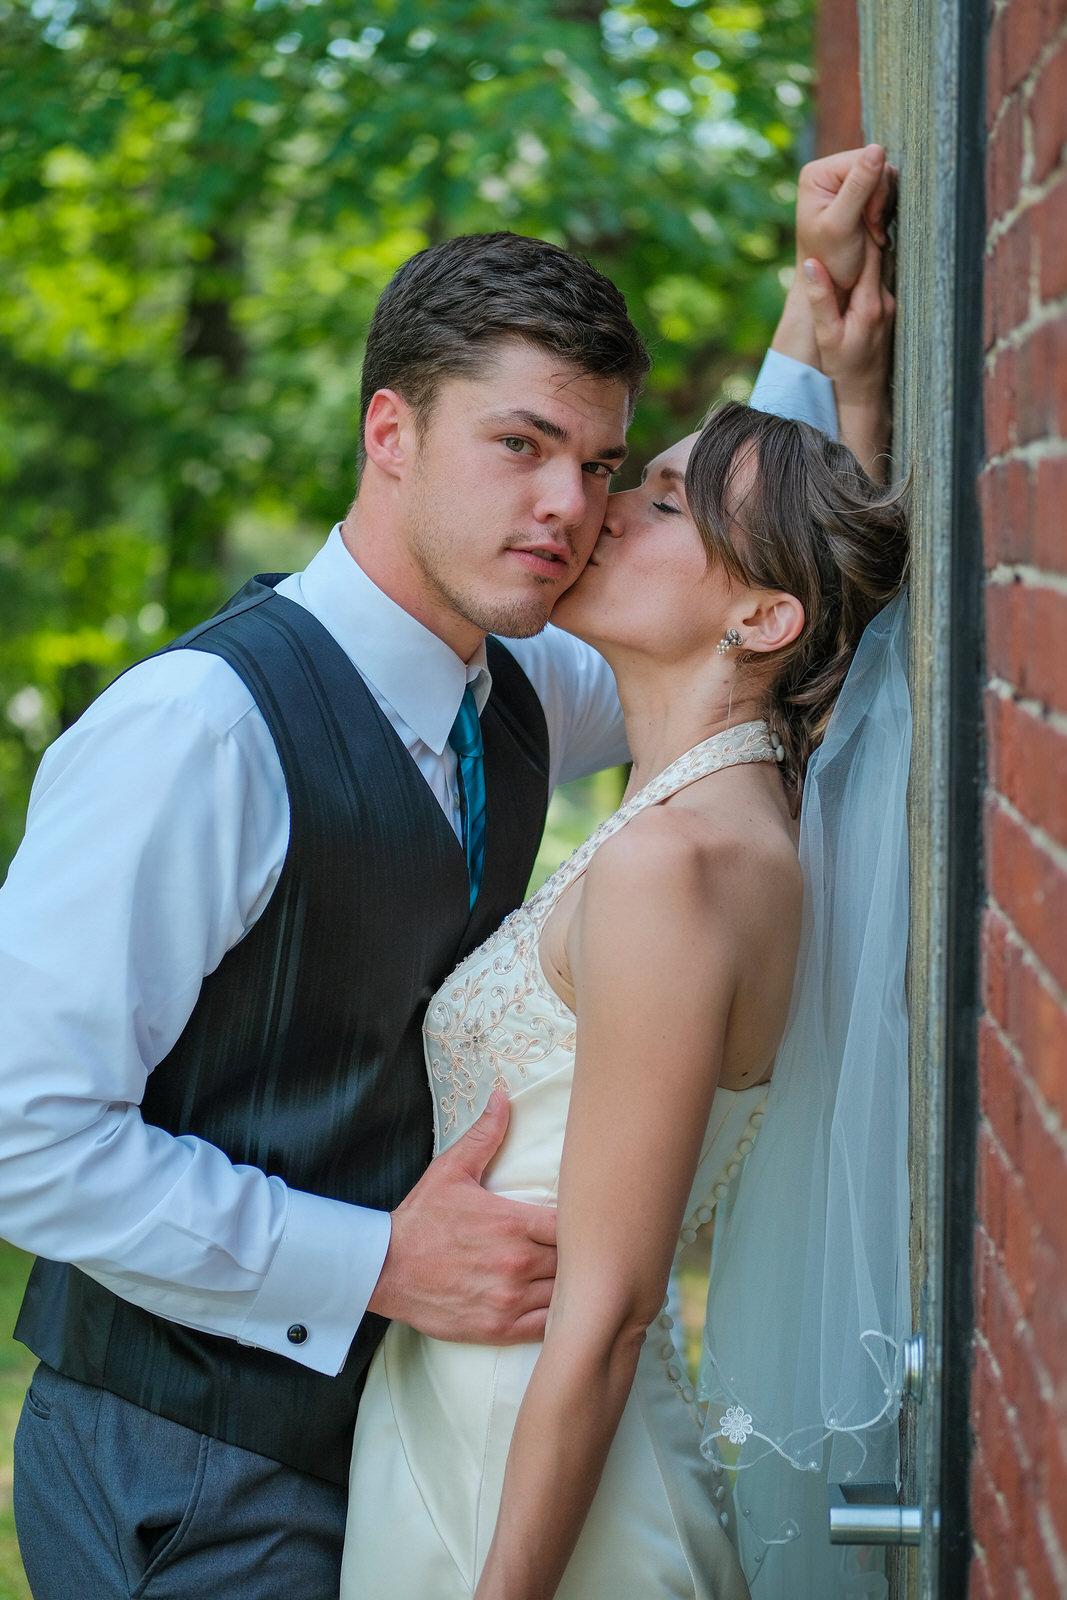 southern-nh-wedding-photography-865-1.jpg